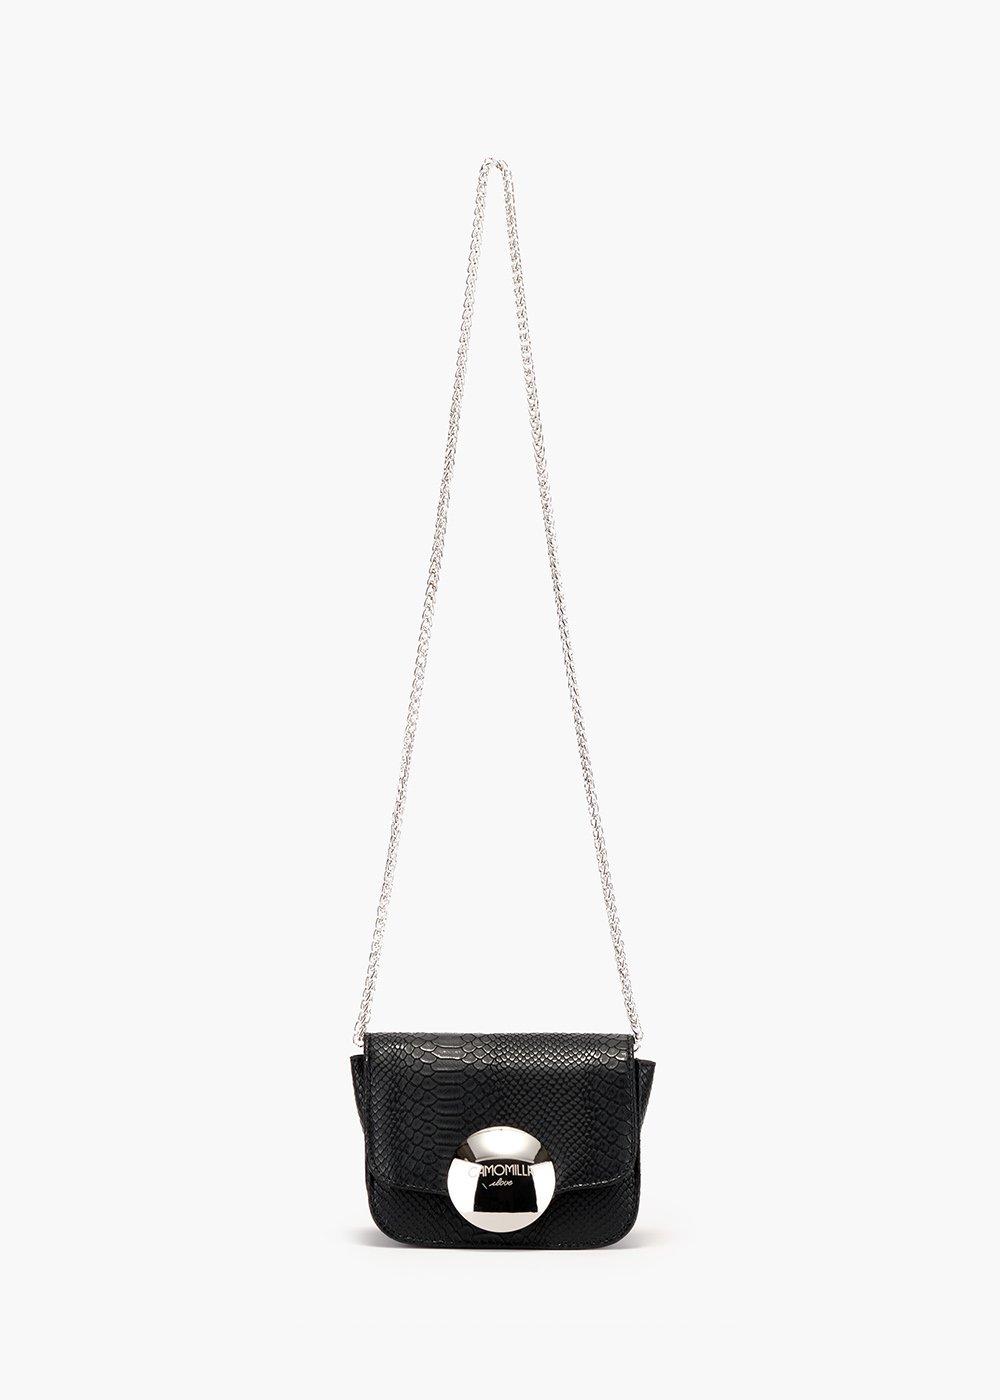 Brianne pochette with chain shoulder strap - Black - Woman